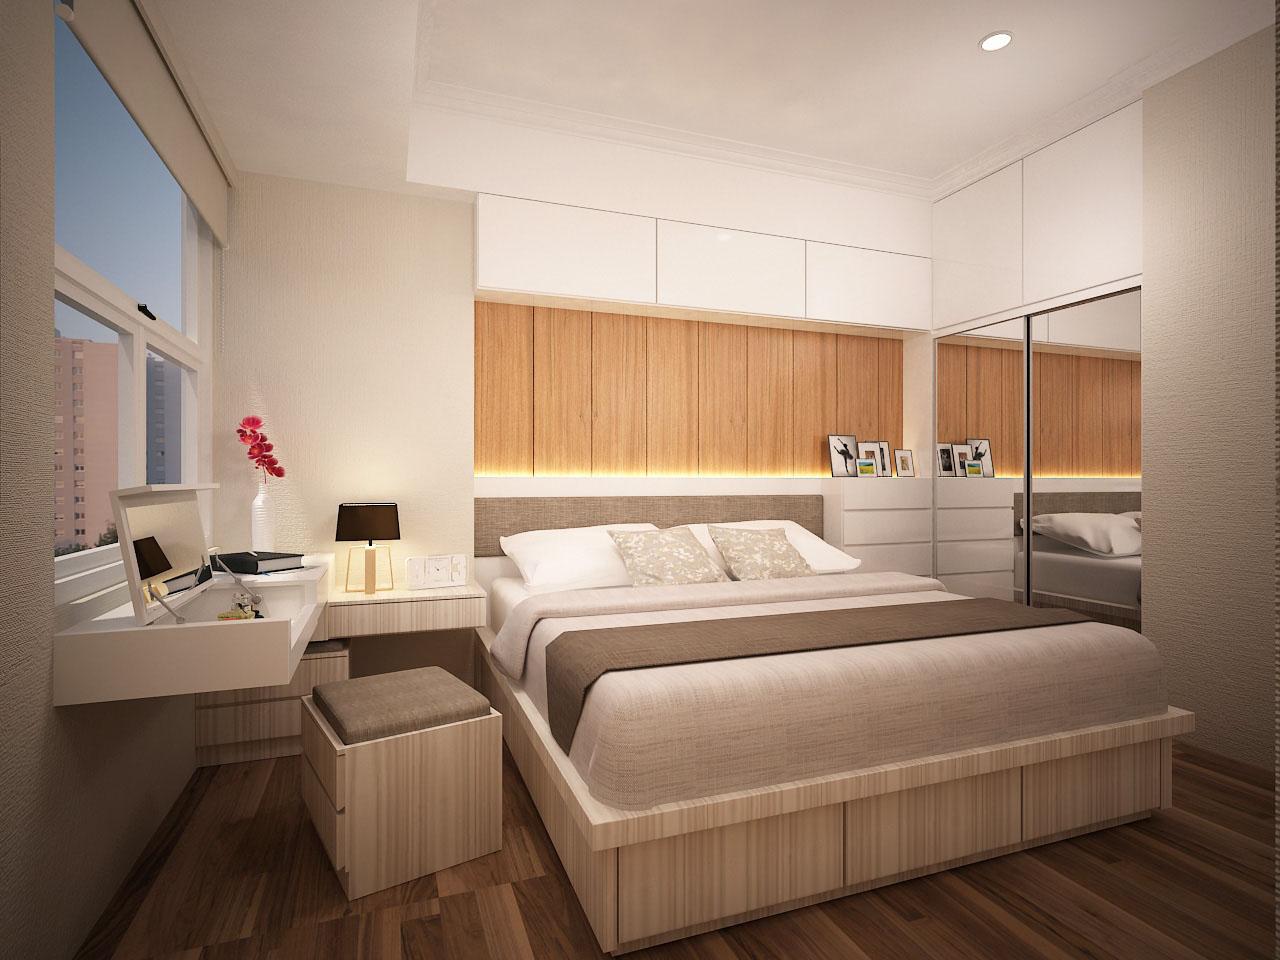 Silkwood-Bedroom-2_3.jpg